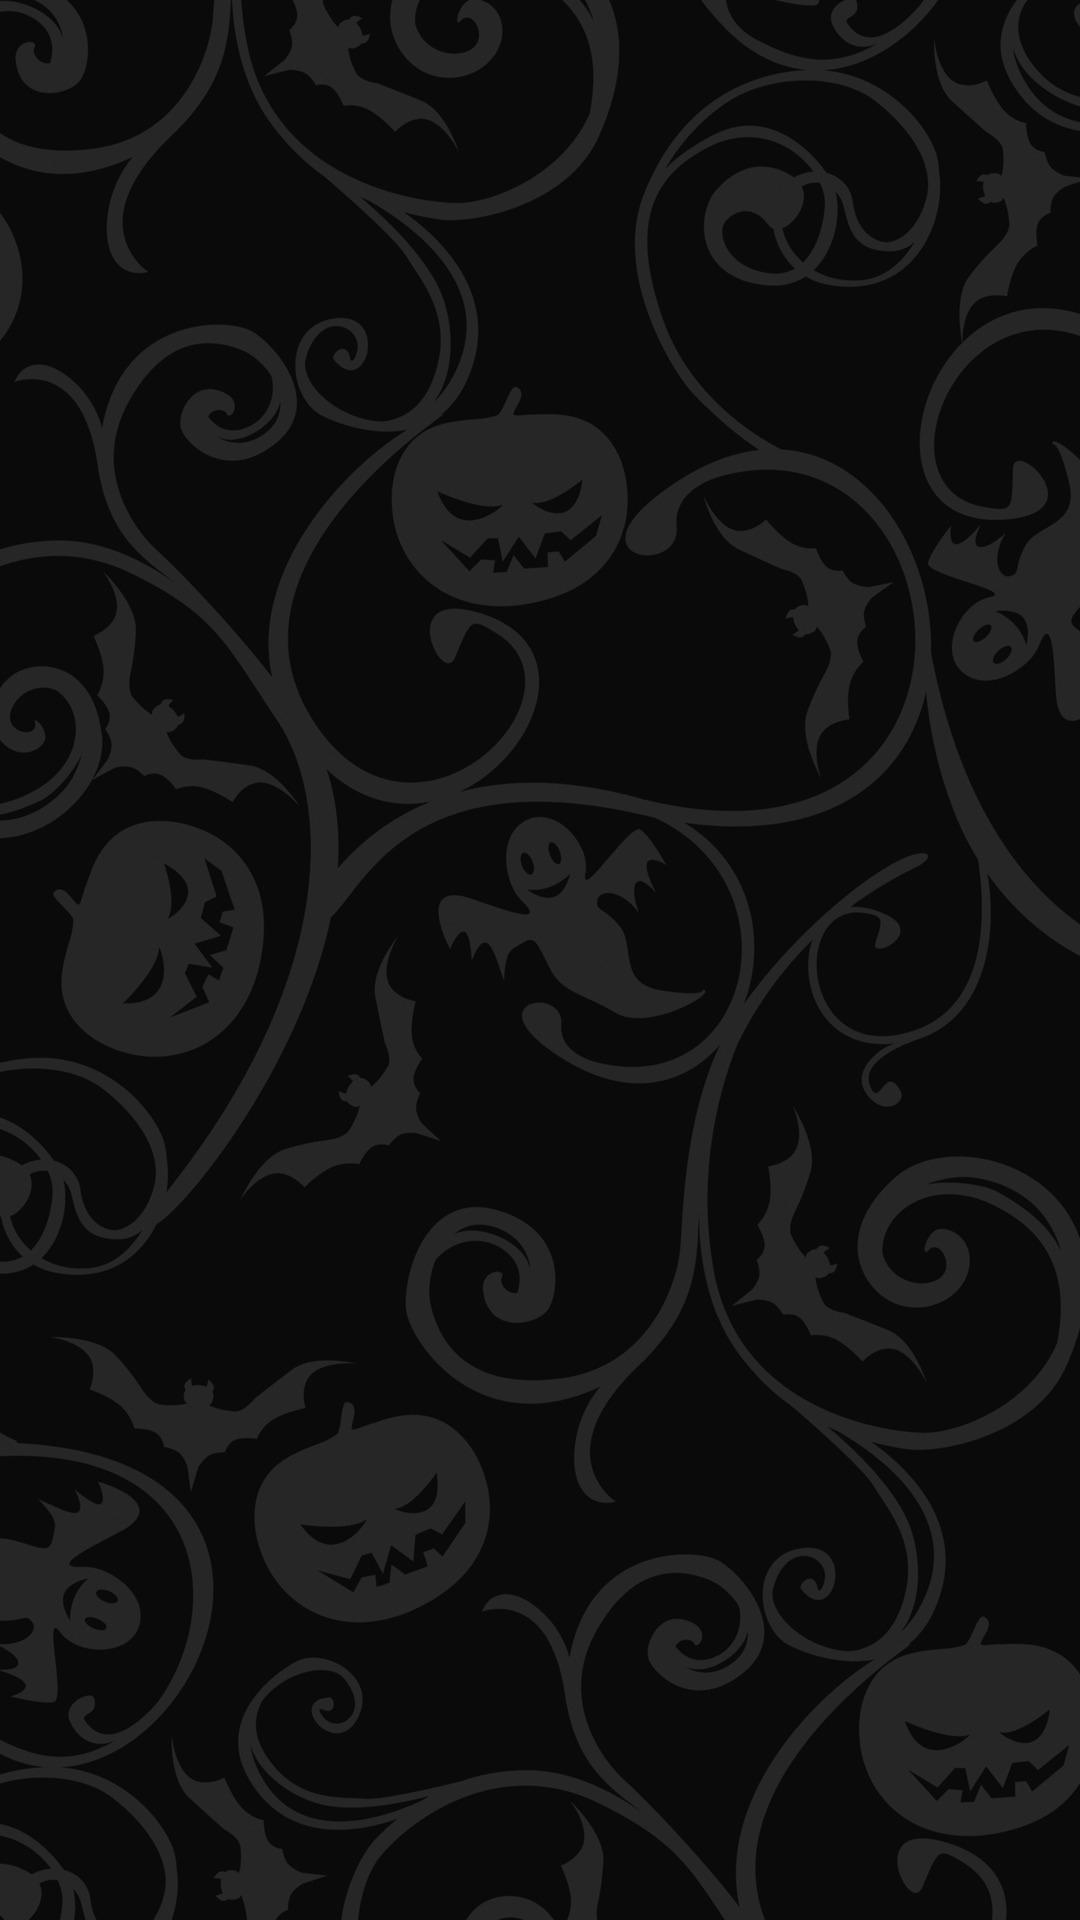 fondos halloween wallpapers gratis - photo #21